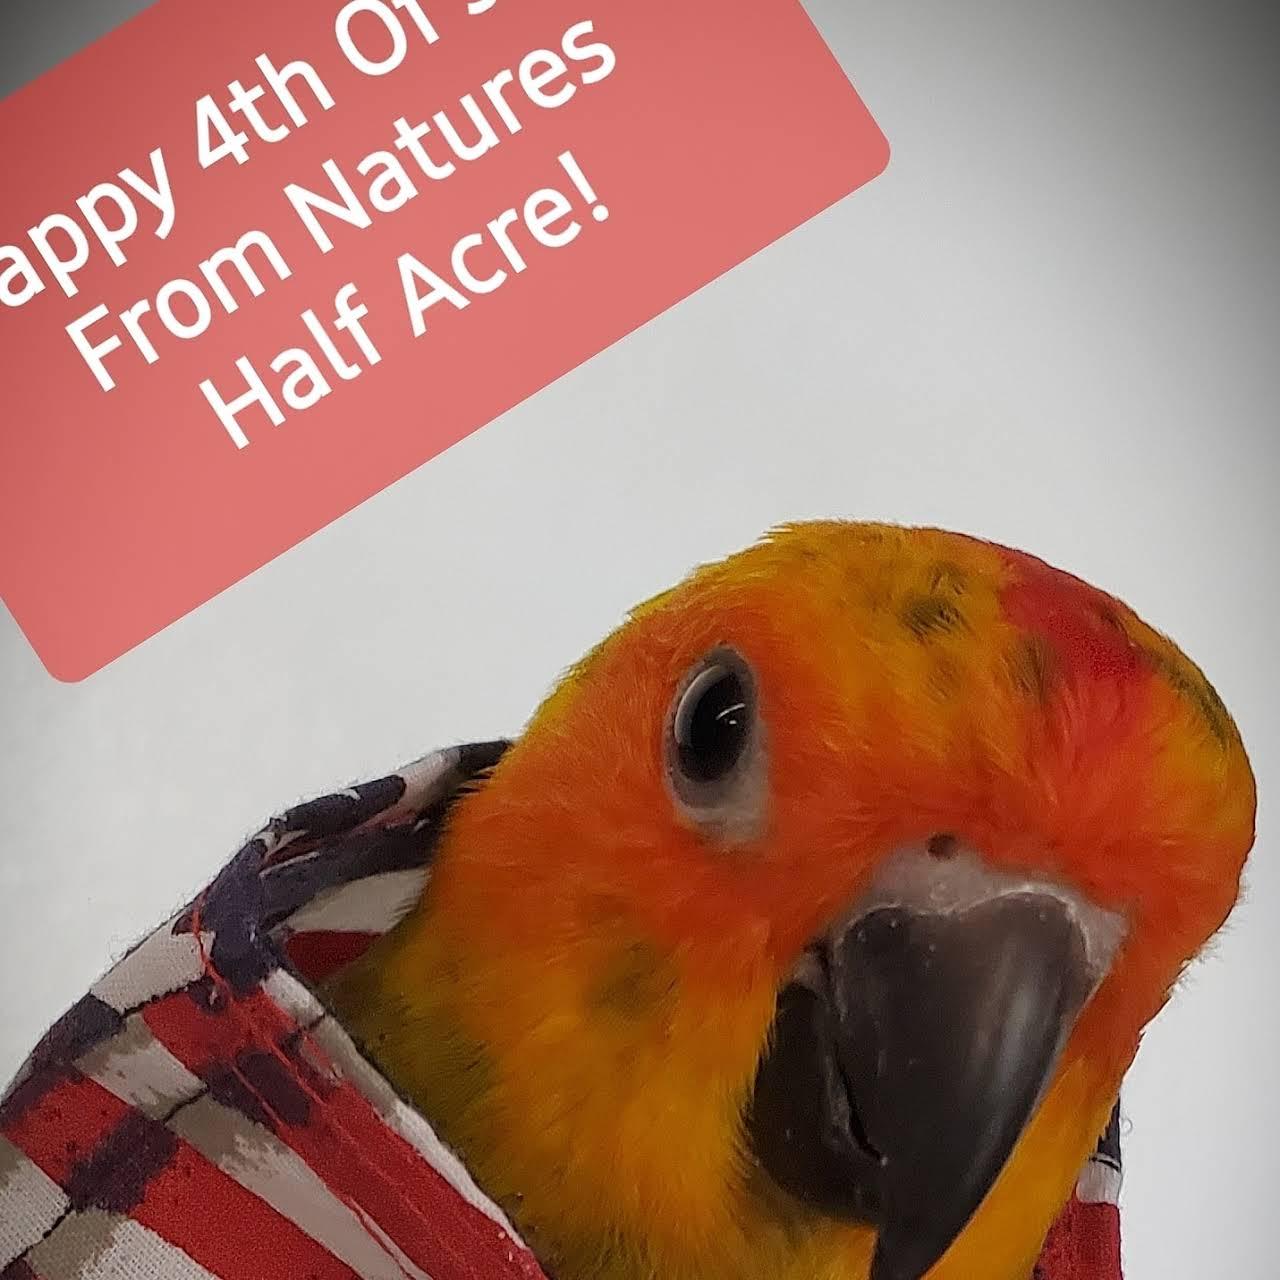 Nature's Half Acre Exoctic Pet Store - Pet Store in Wichita